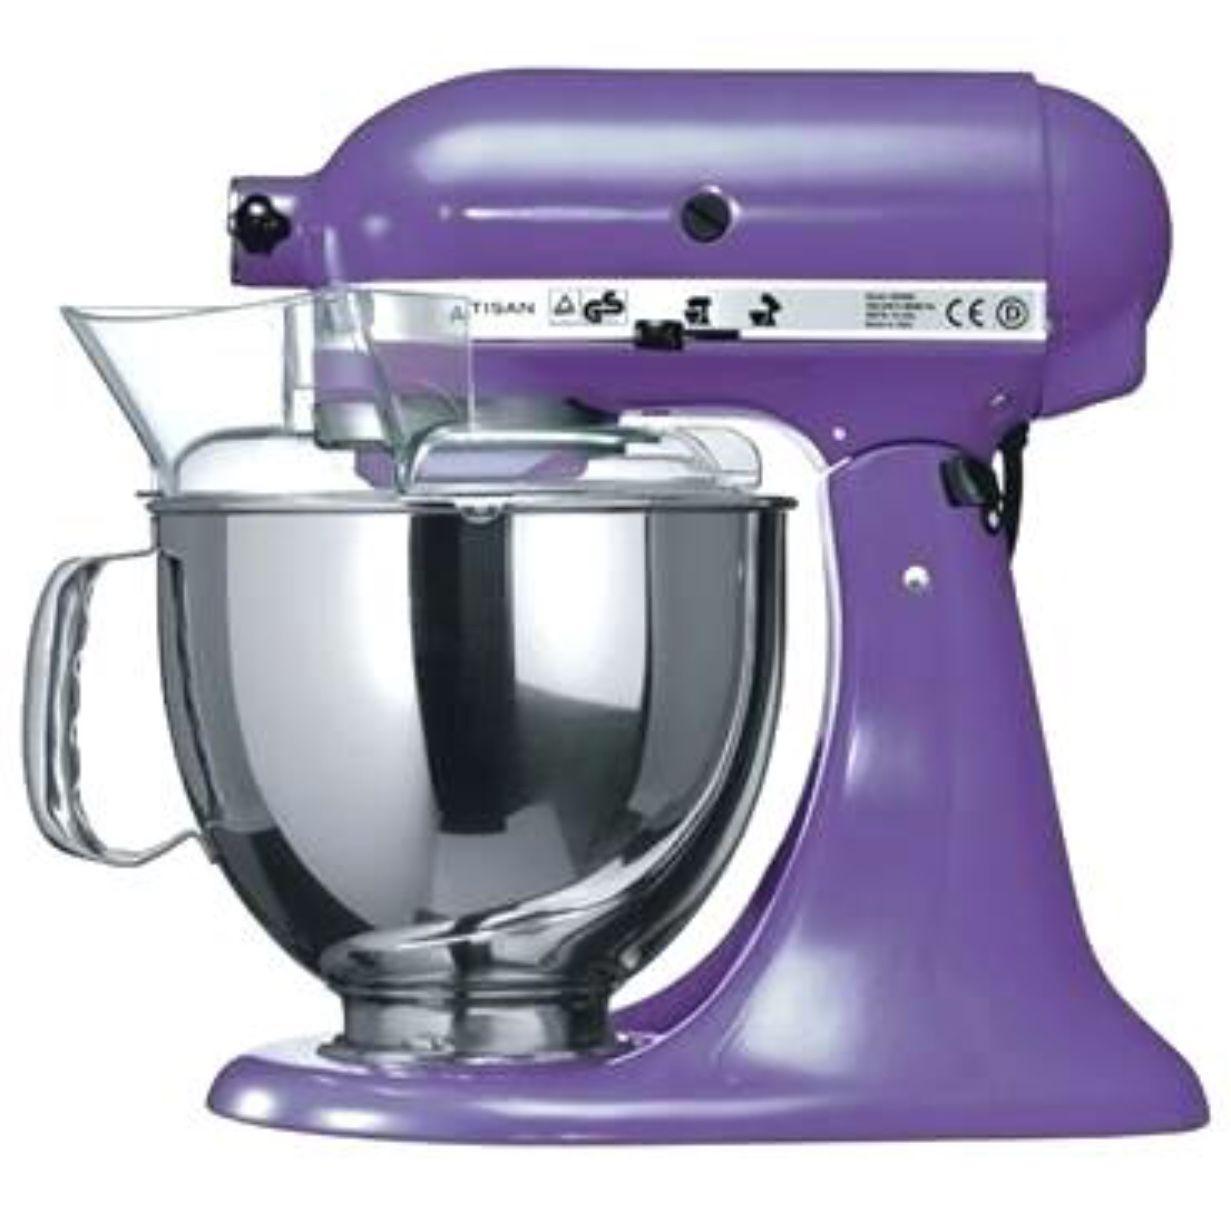 366f07f397fa24e42ffc2a08b383614f Kitchenaid Almond Cream Toaster